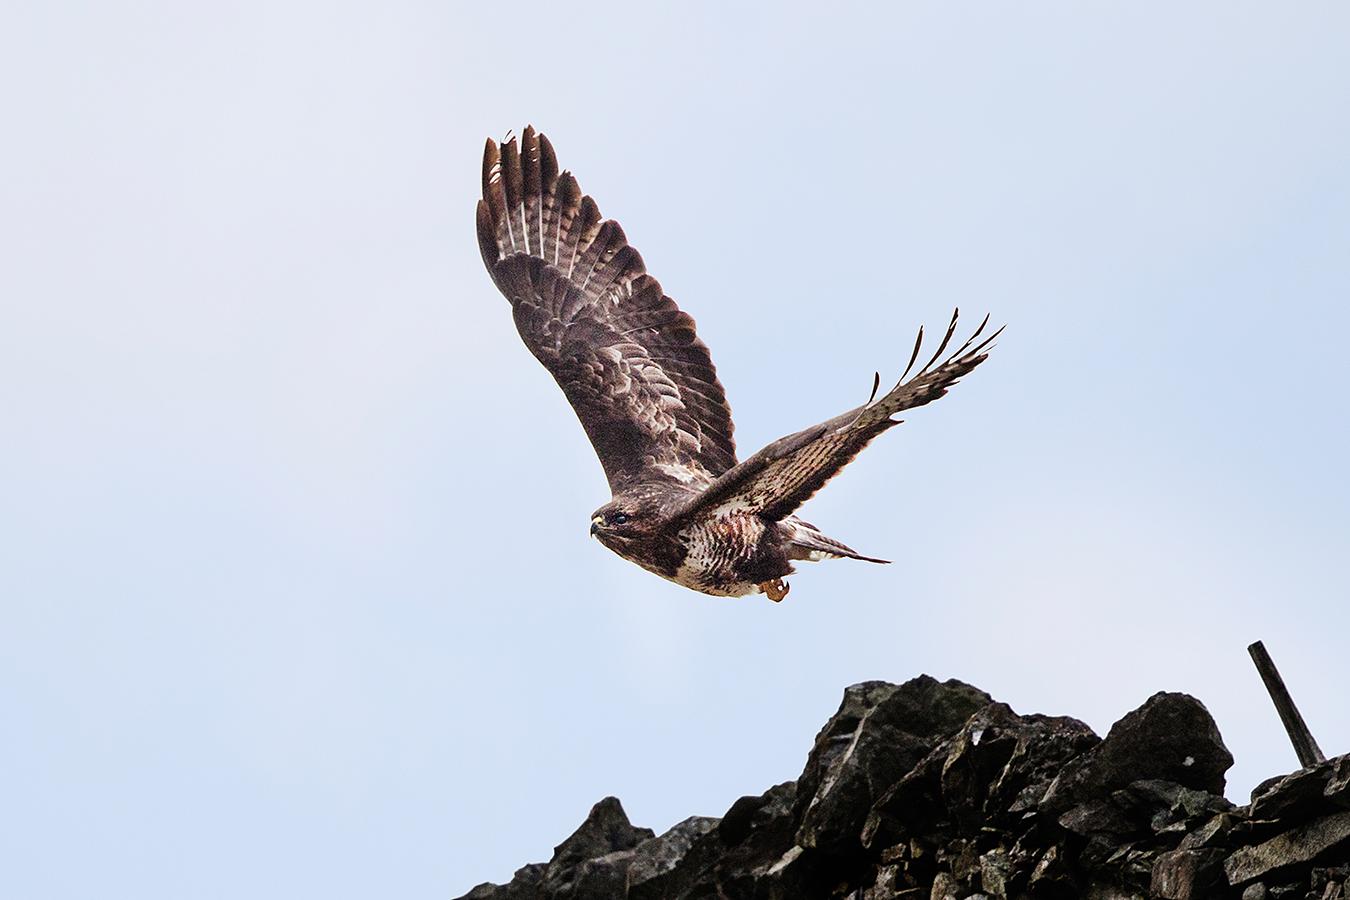 Common Buzzard, Rusland Valley, Lake District